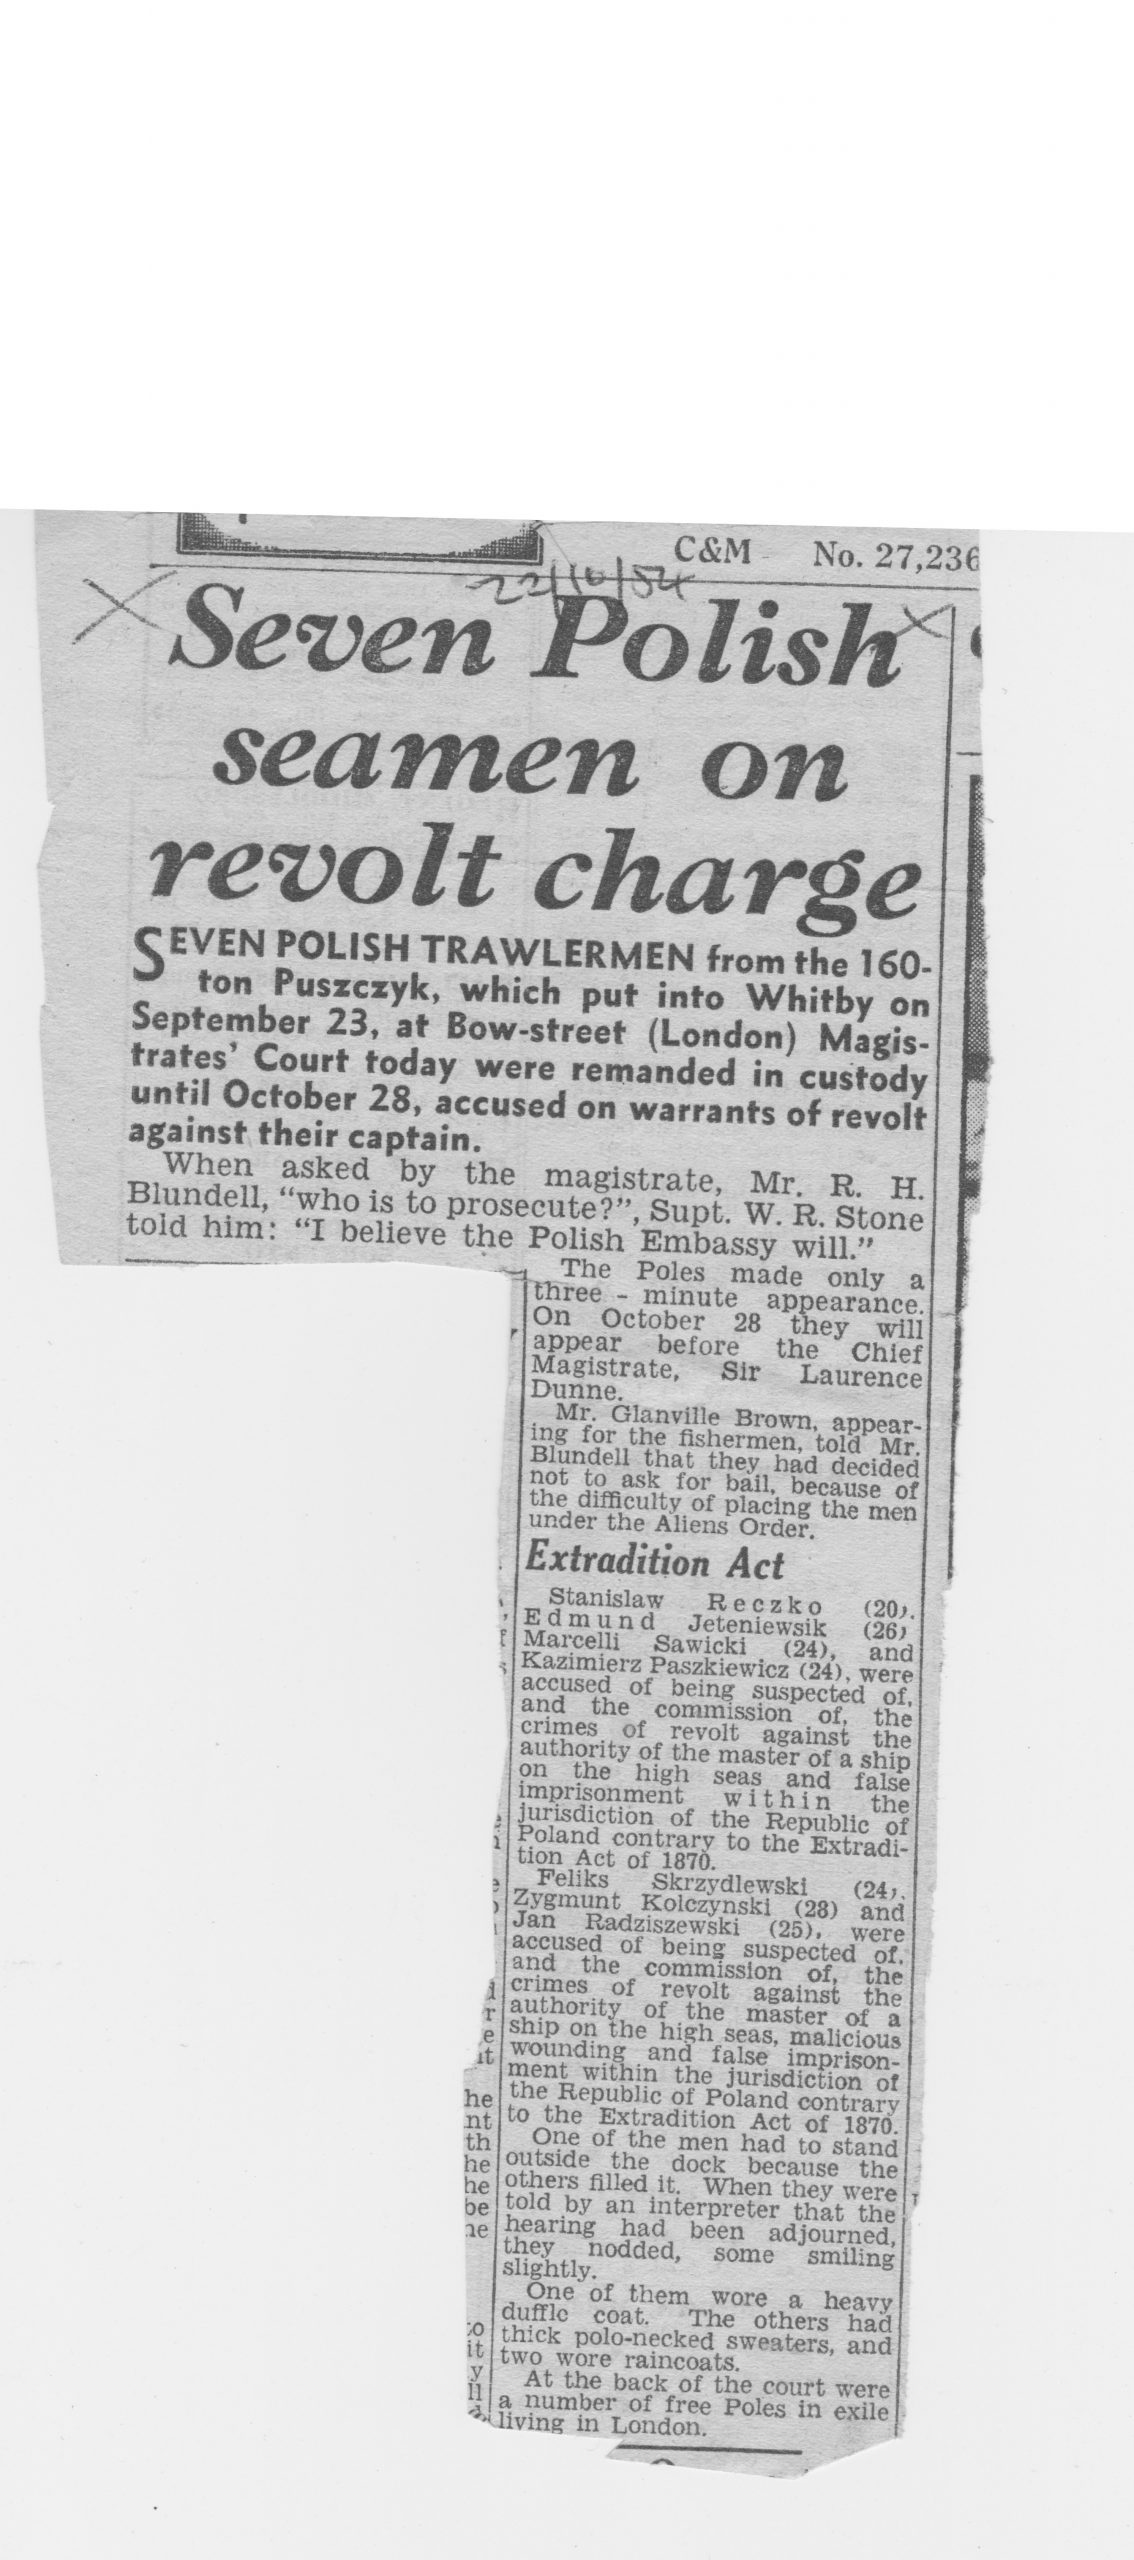 Polish seamen charged with revolt